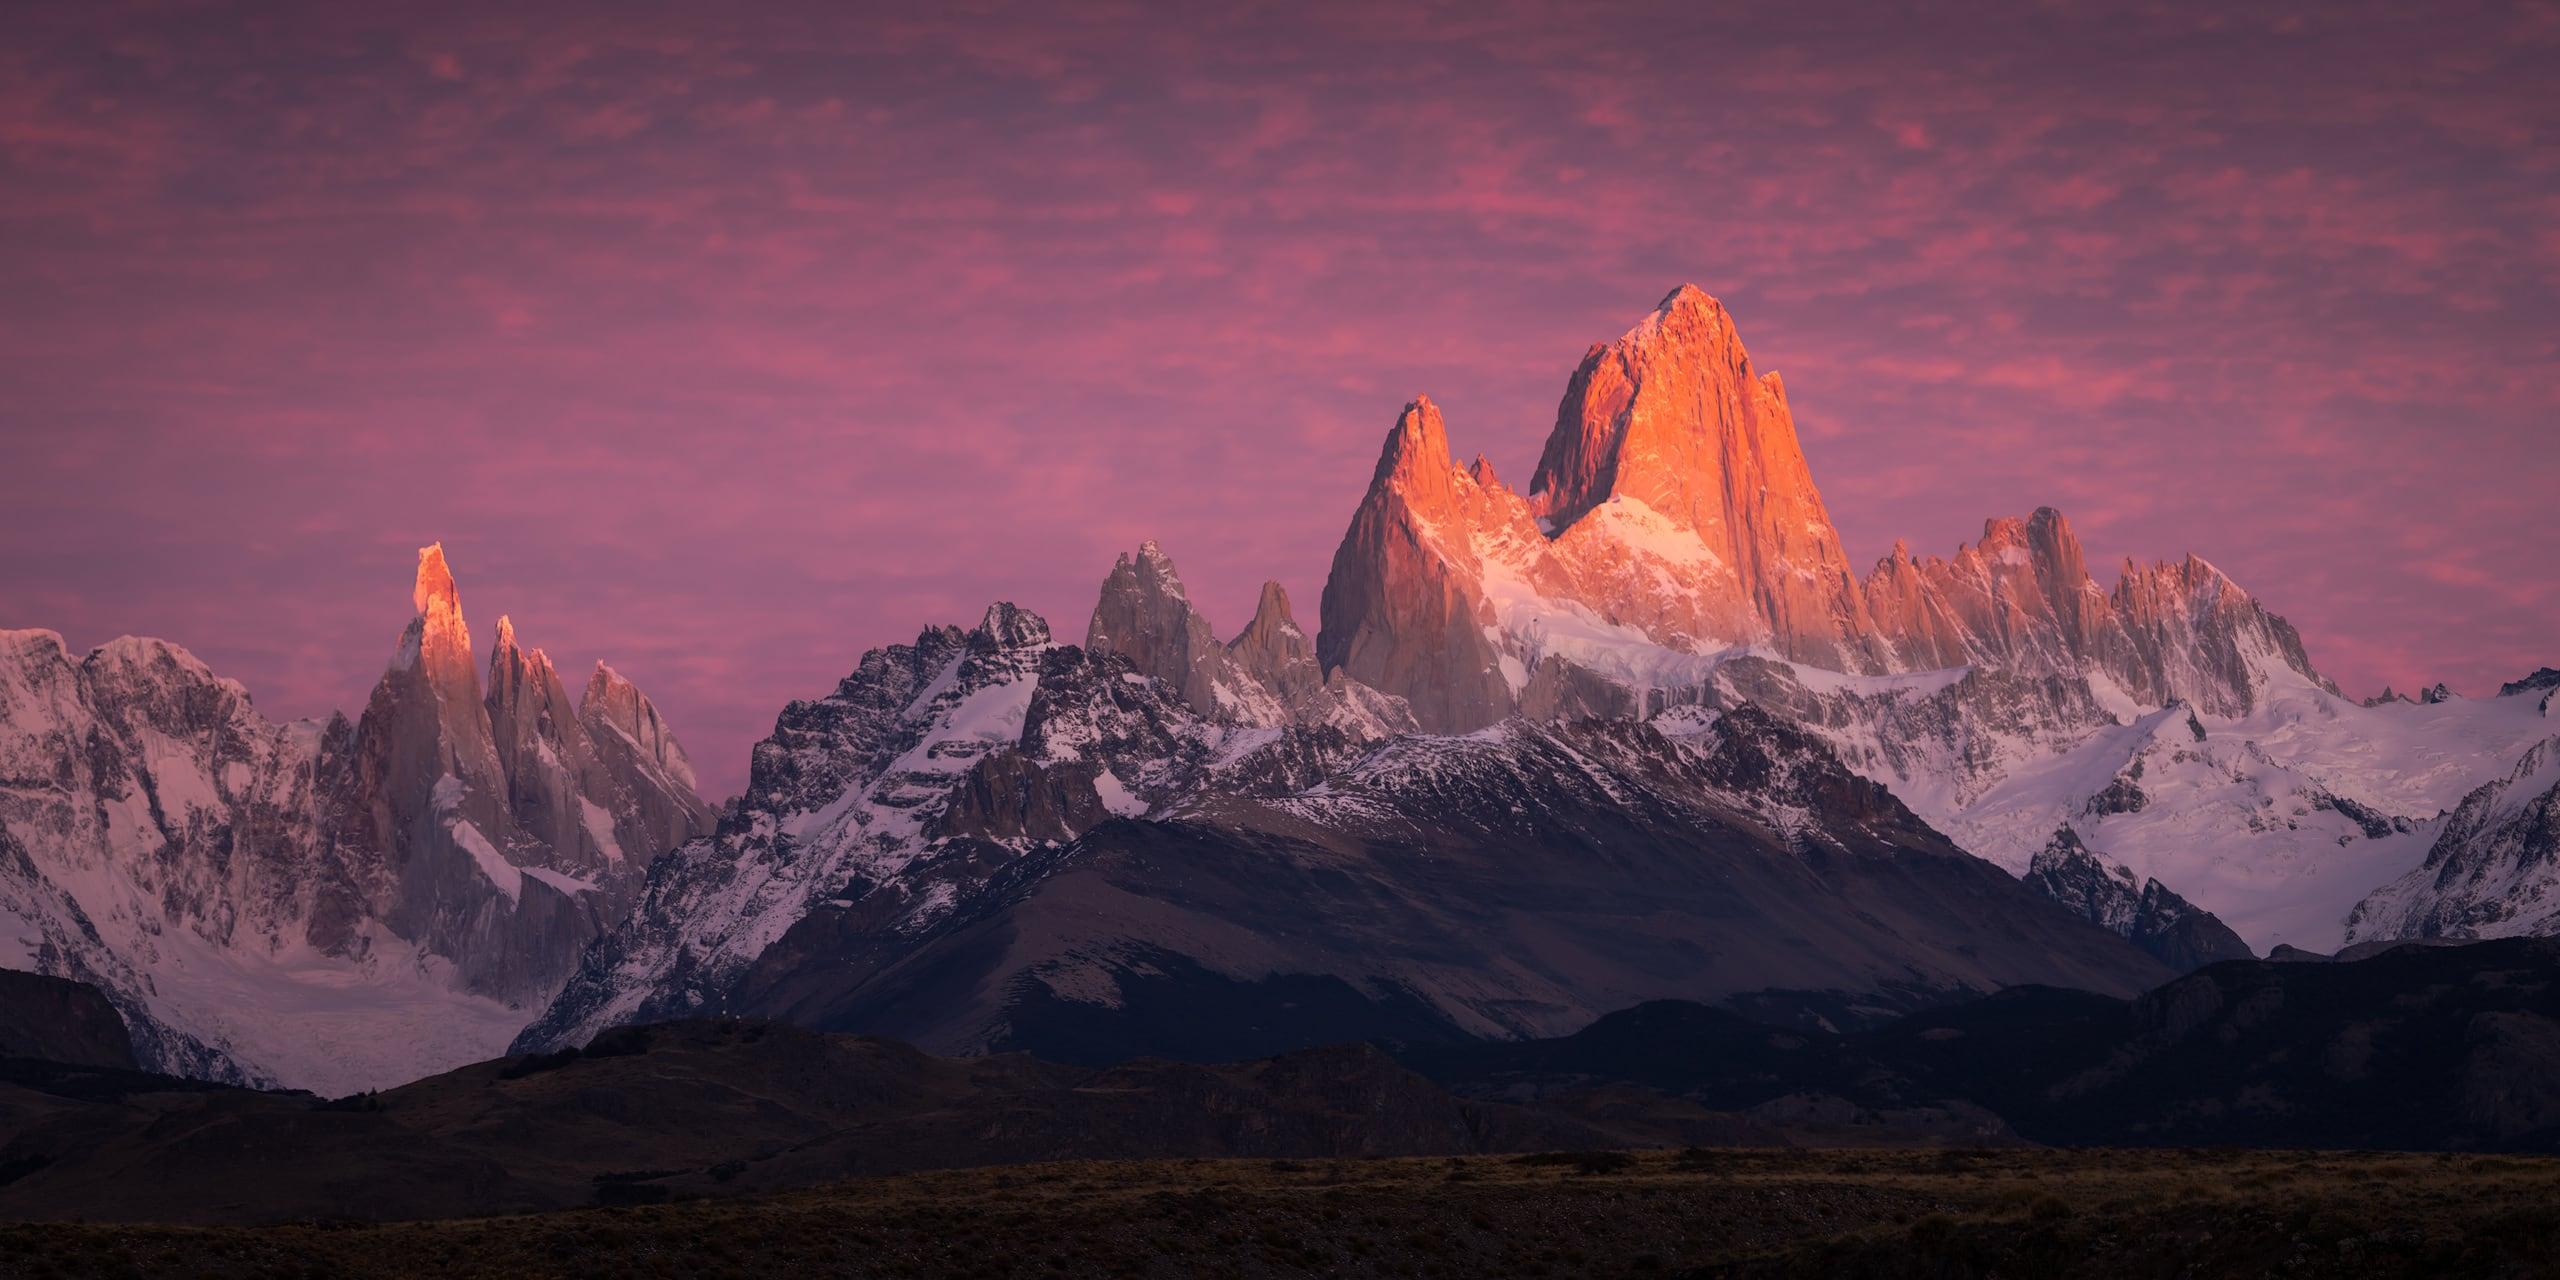 Warm sunrise light on the mountains of Parque Nacional los Glaciares